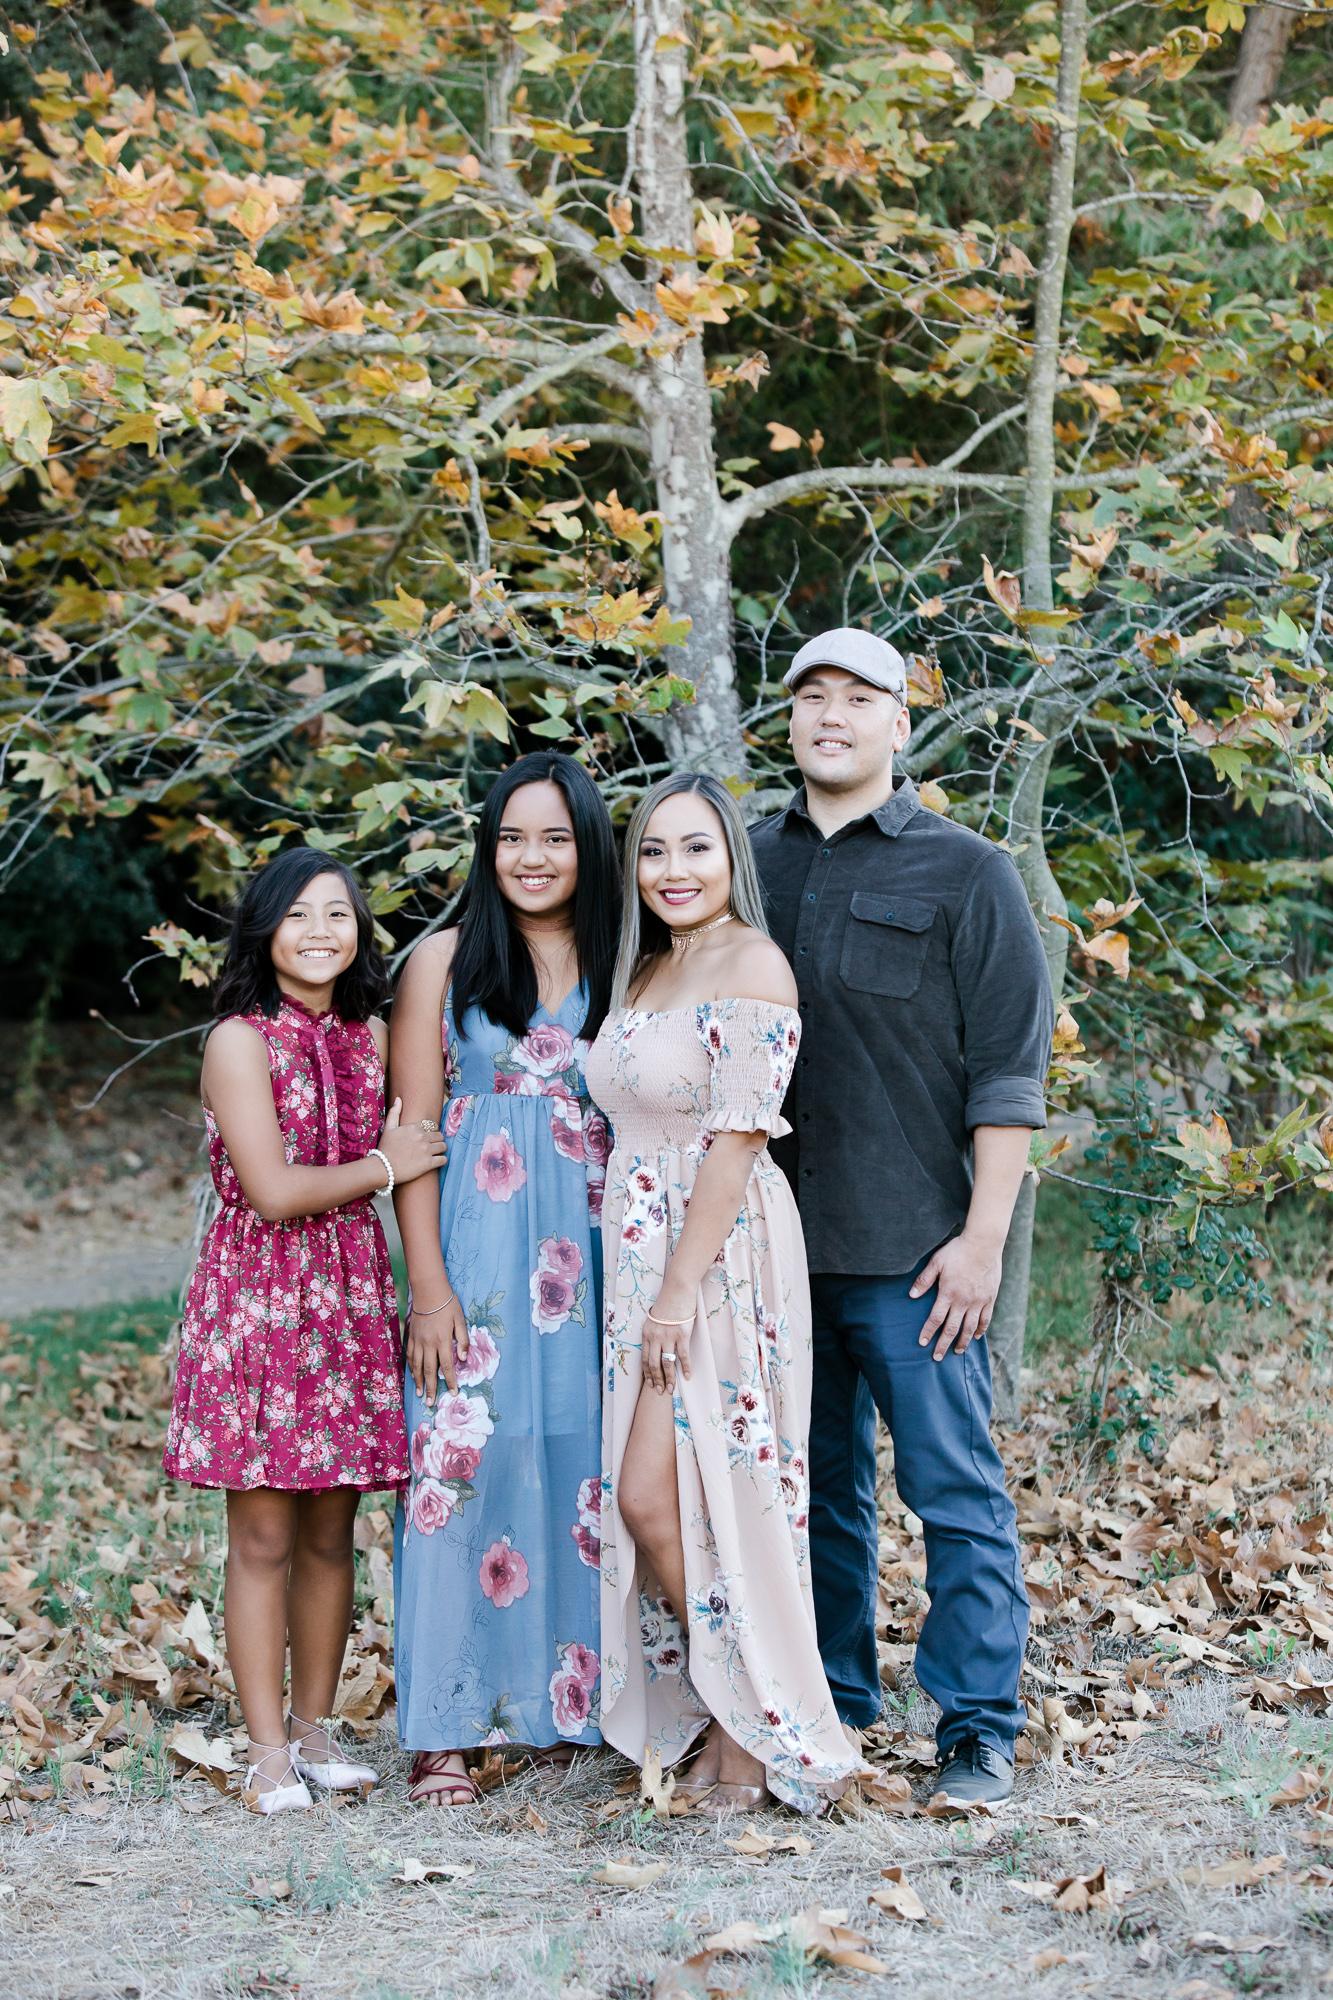 NEMA Photo R.Tabar2017010 - Tabar Family | Fall session | San Diego family photographer | Los penasquitos canyon preserve